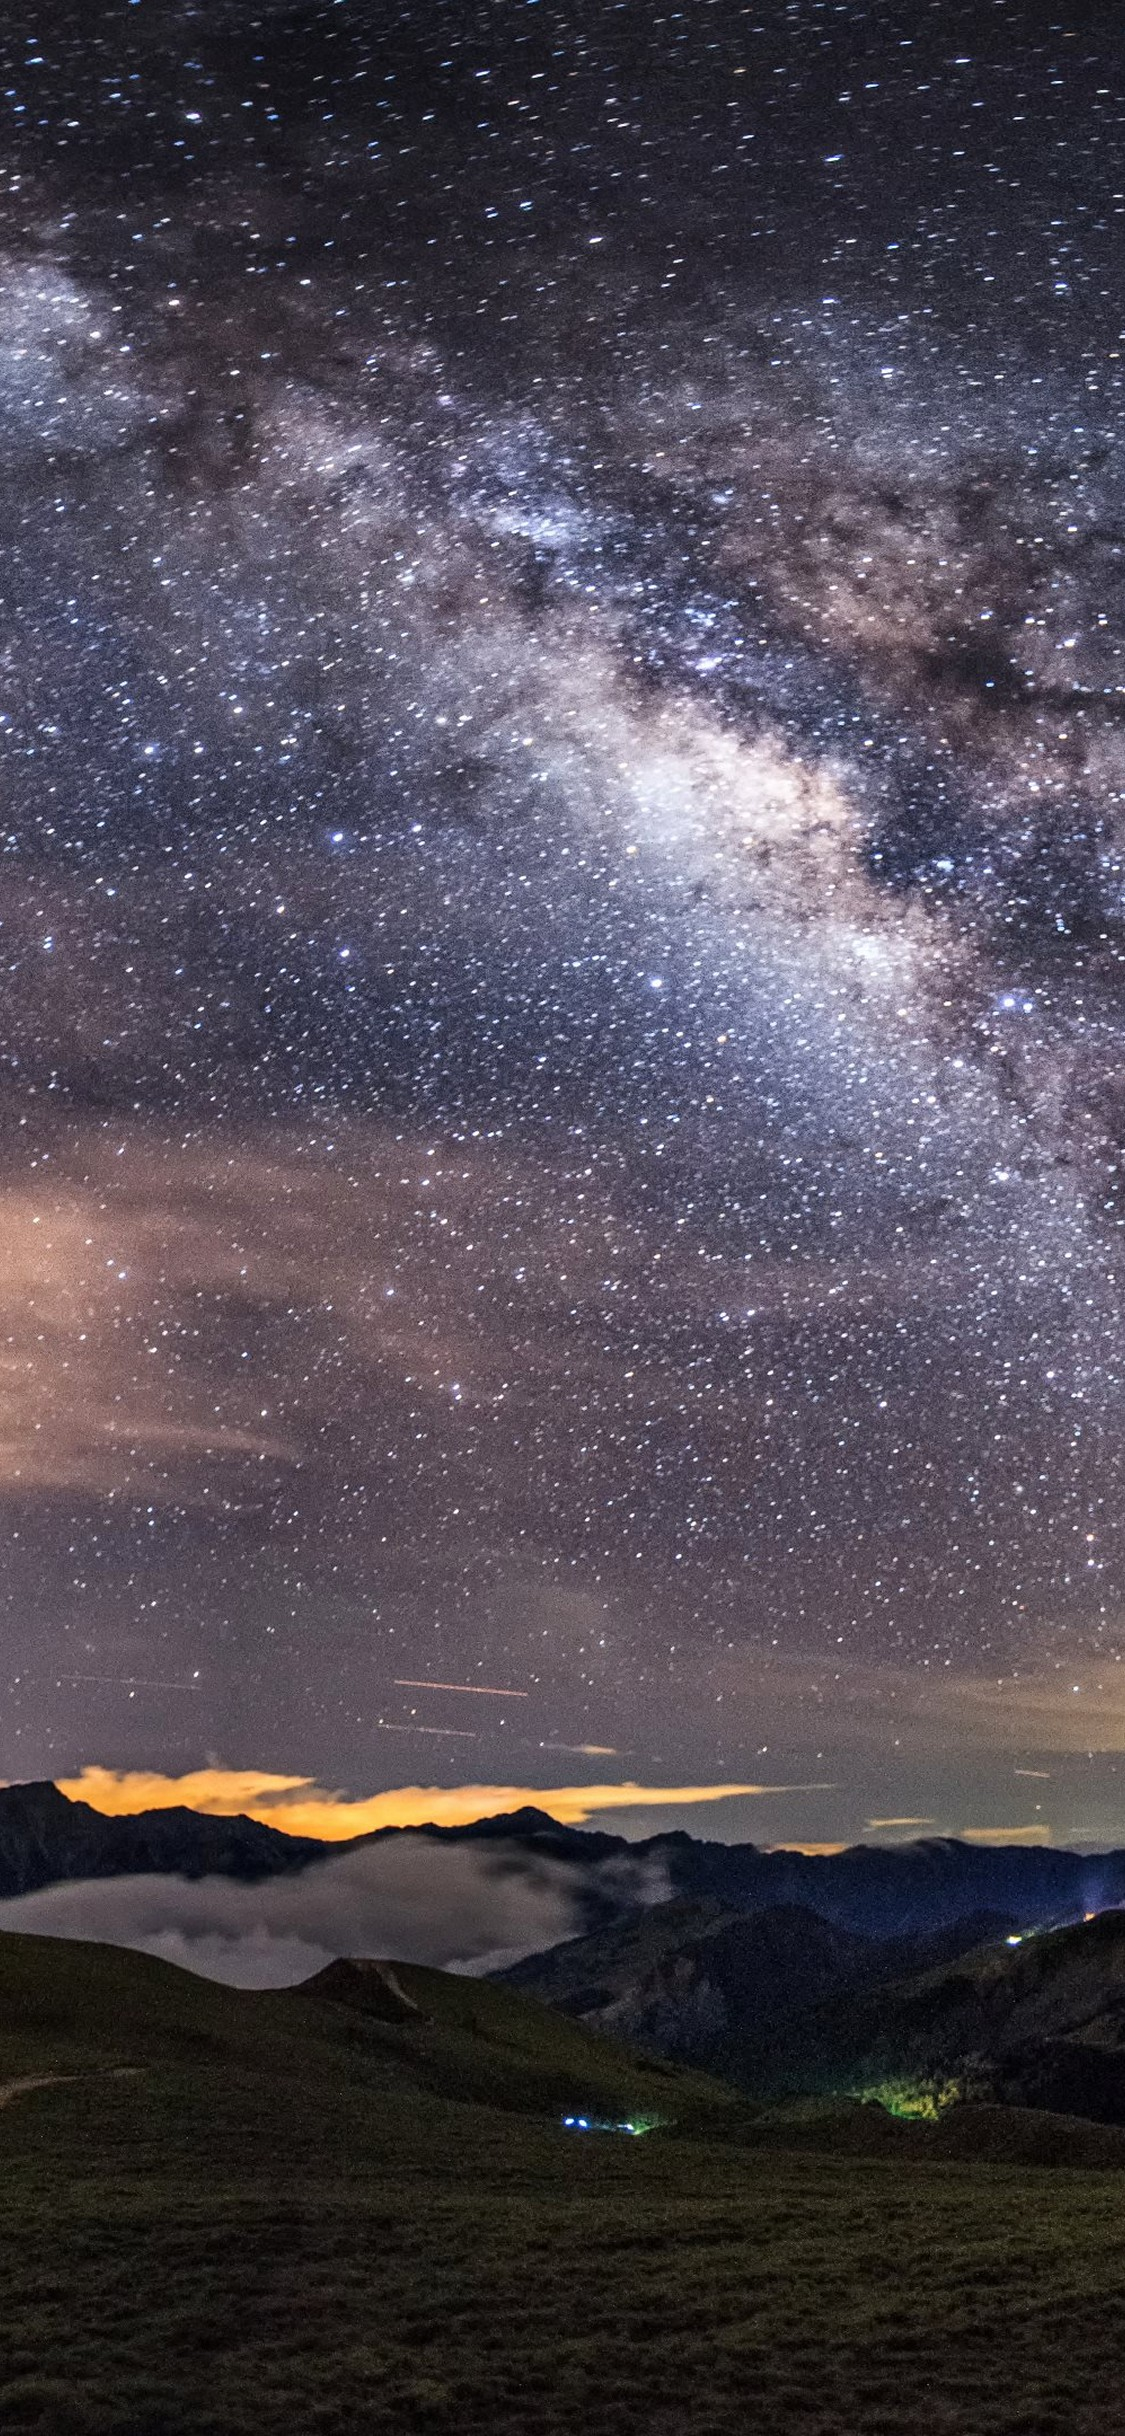 Milky Way HD Wallpaper - [1125x2436]